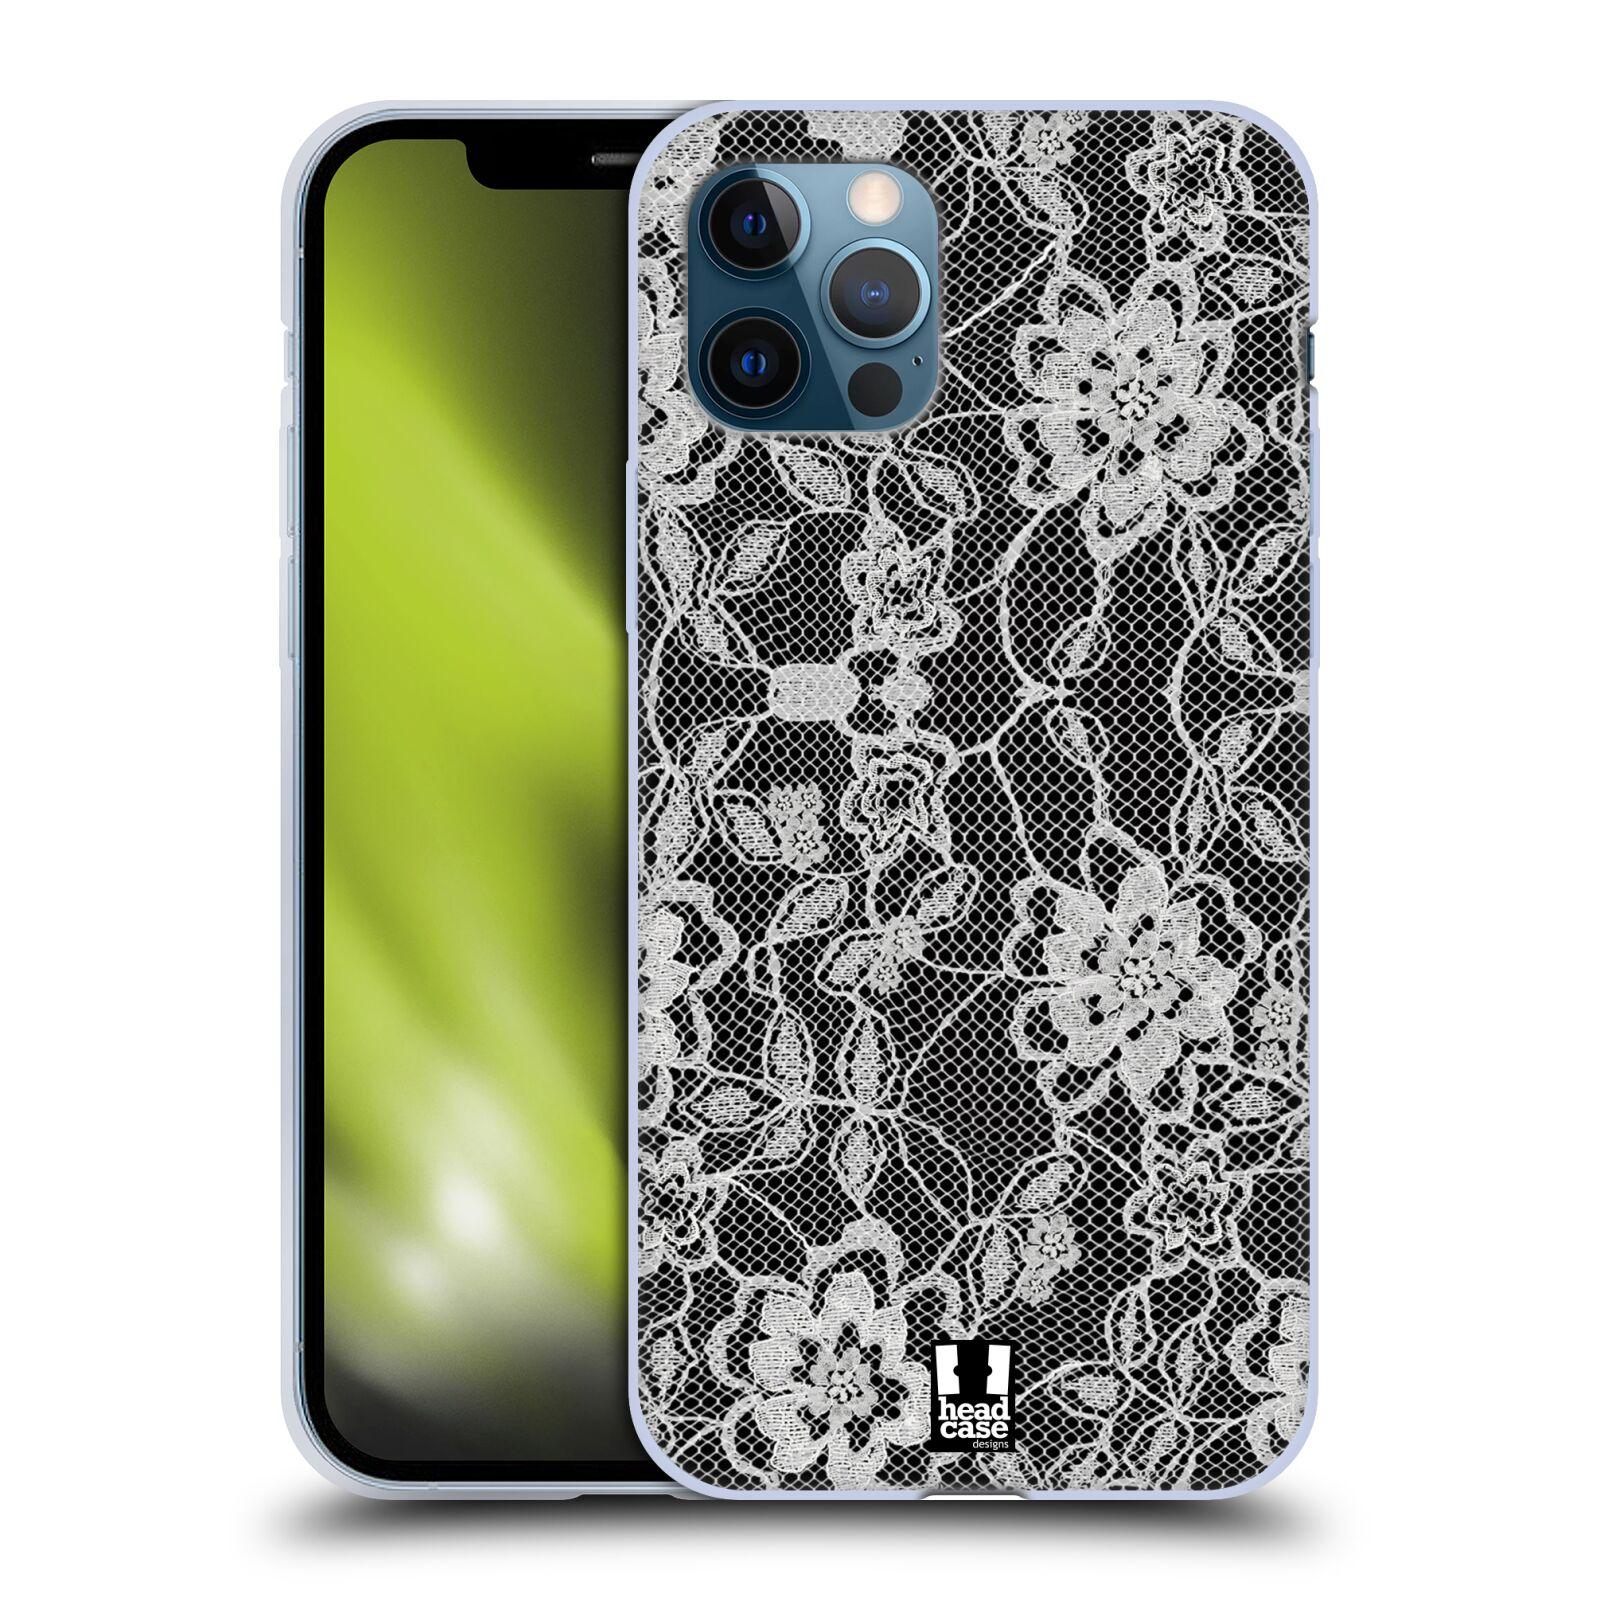 Silikonové pouzdro na mobil Apple iPhone 12 / 12 Pro - Head Case - FLOWERY KRAJKA